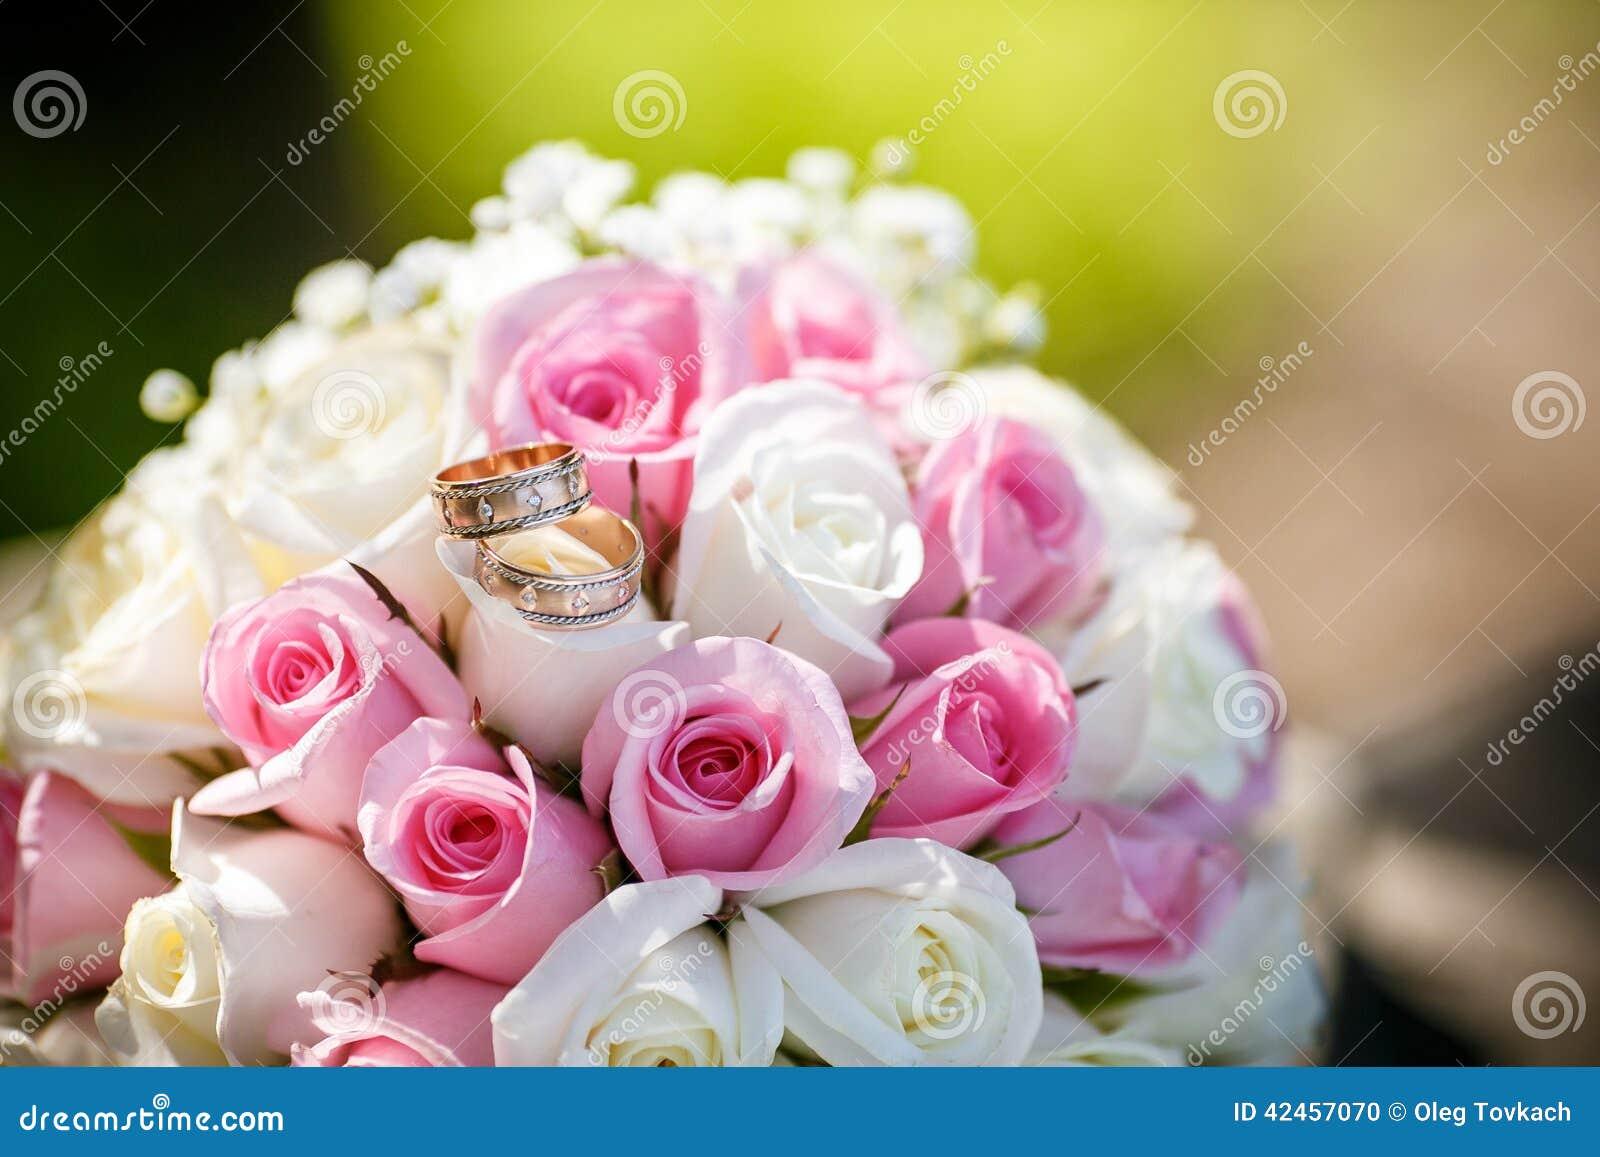 Eheringe auf Rosen blüht